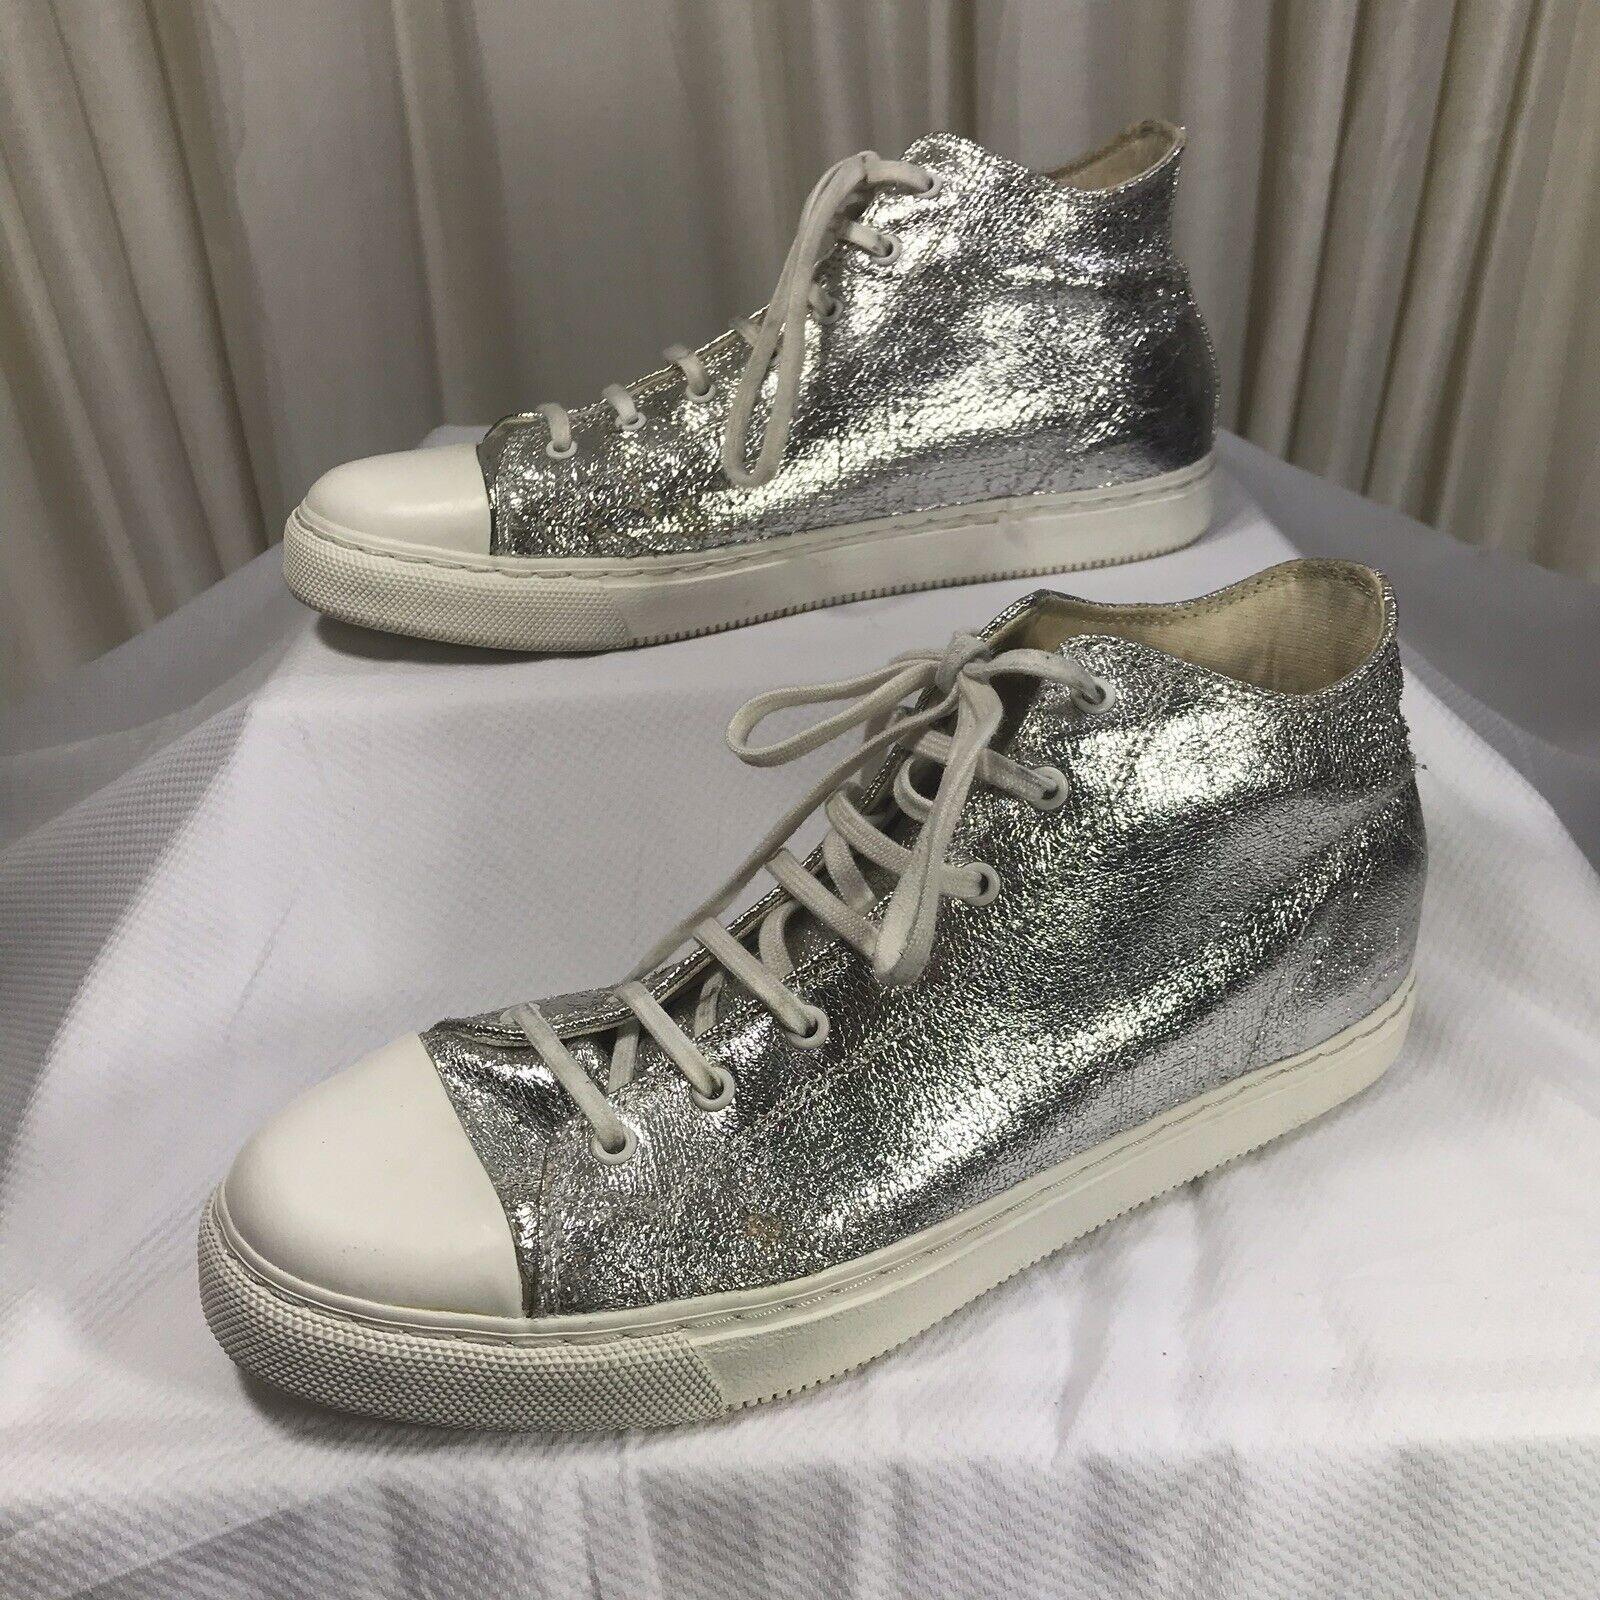 "Zara Man shoes Sneakers Silver High Top Lace Up Metallic ""chucks"" Size 42 US 9"